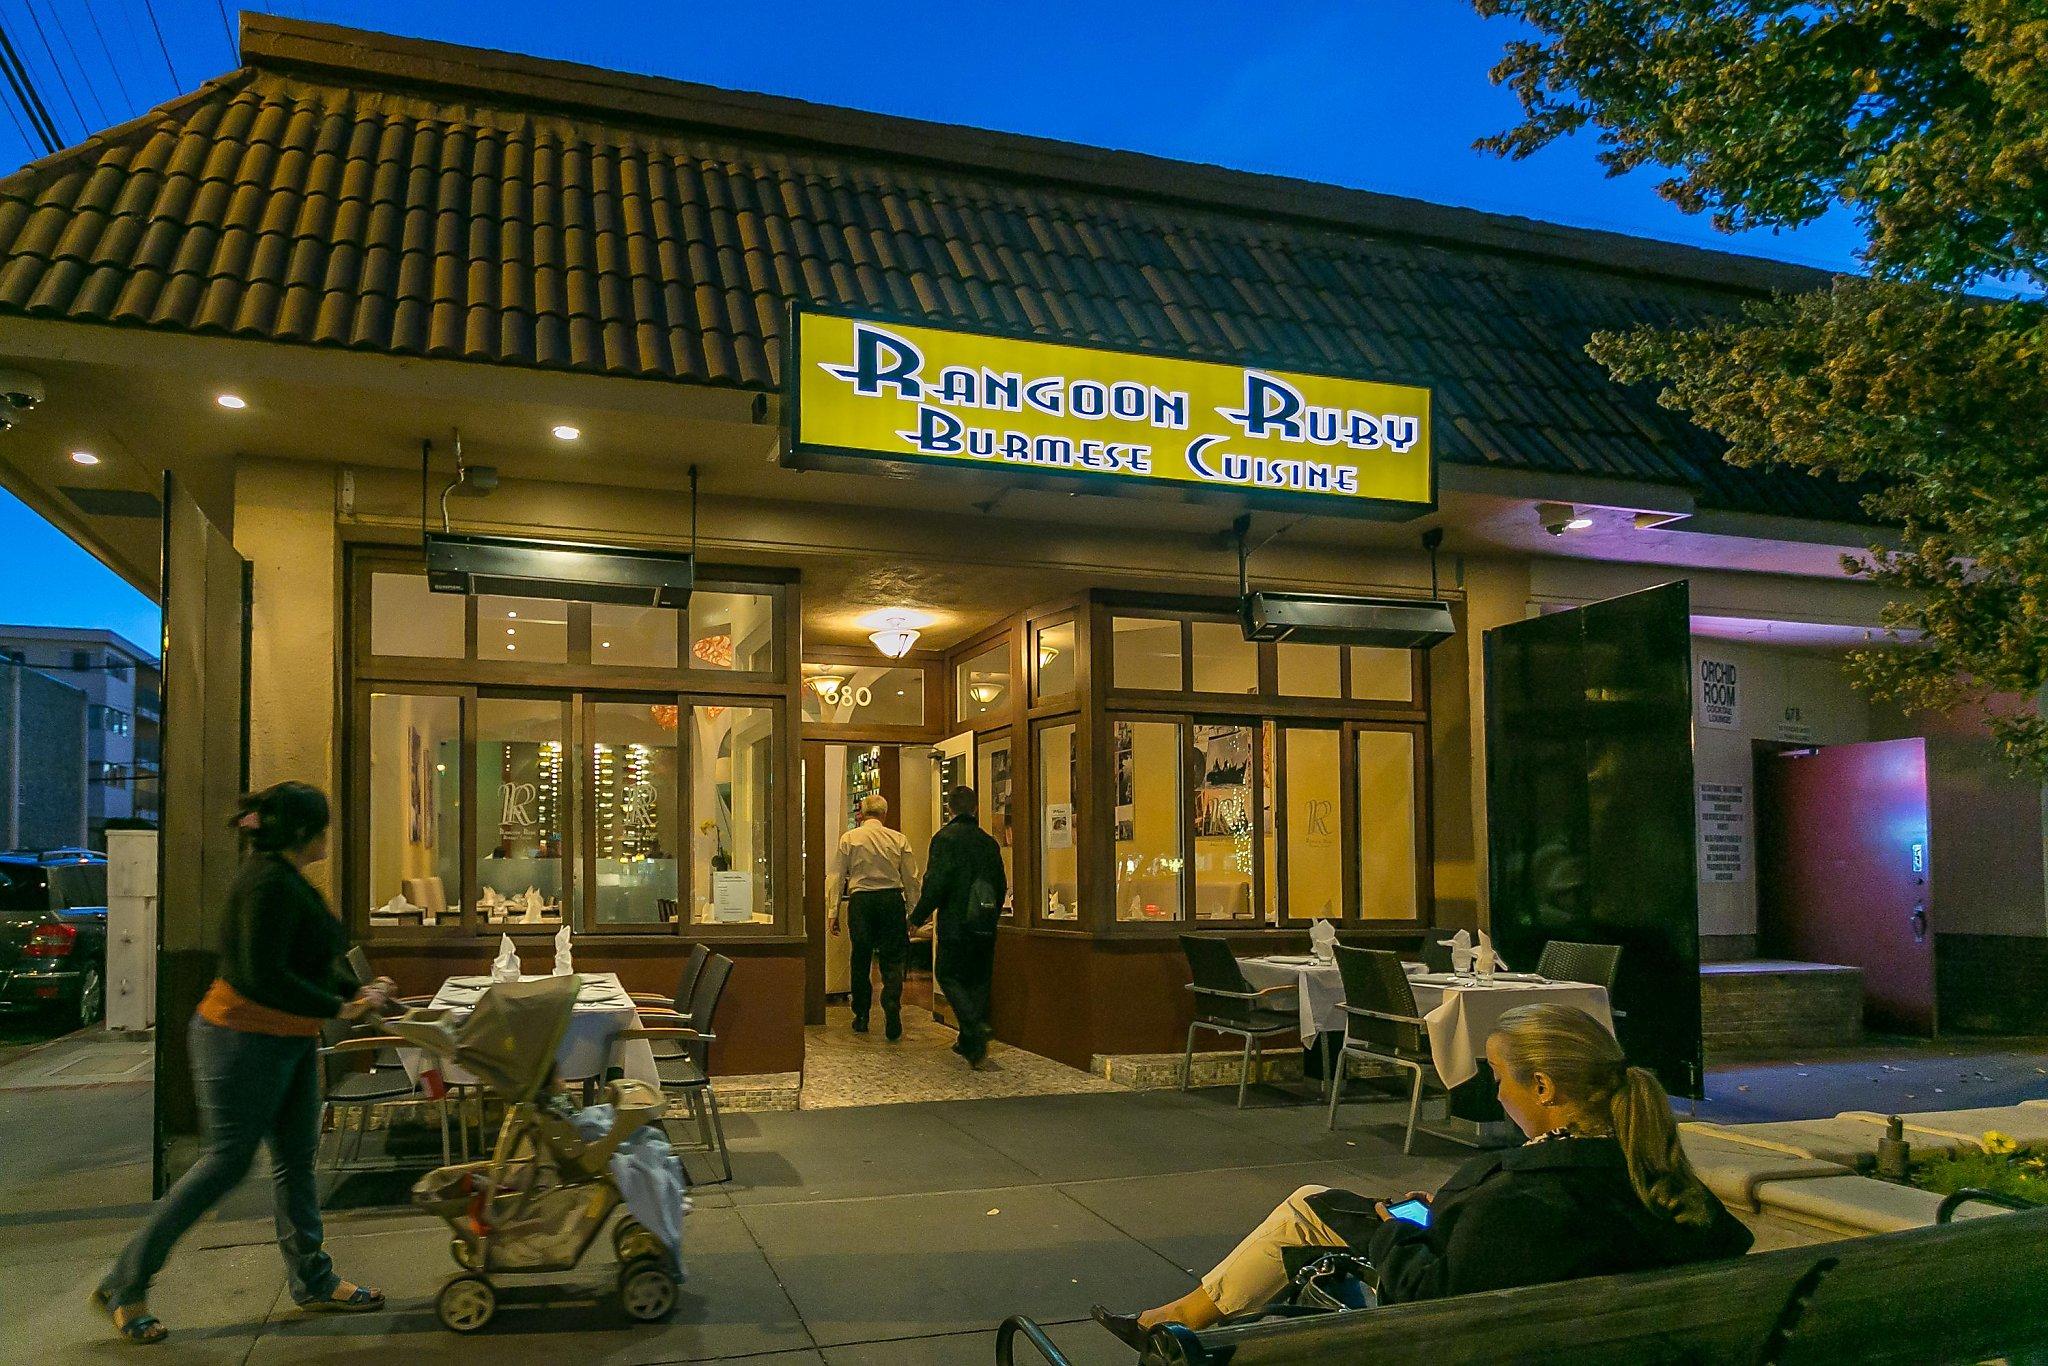 Rangoon Ruby Restaurant Chain Settles Wage Theft Claim For